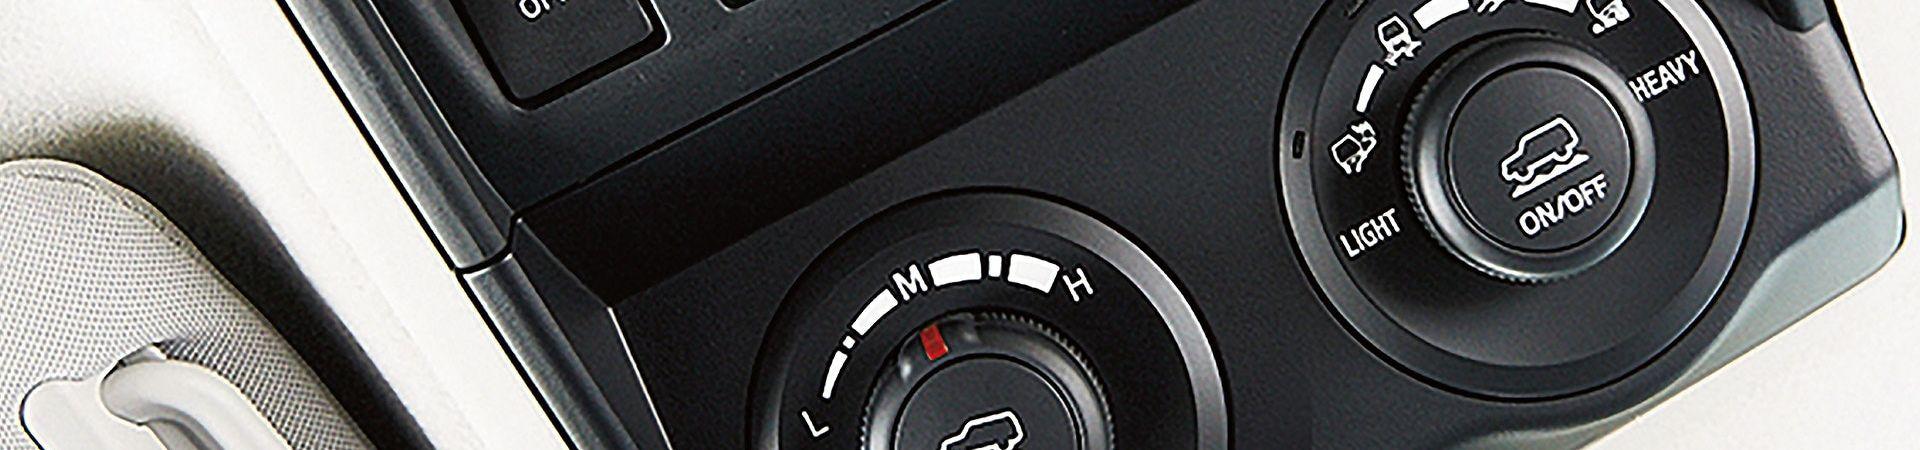 2019 Toyota 4Runner Controls